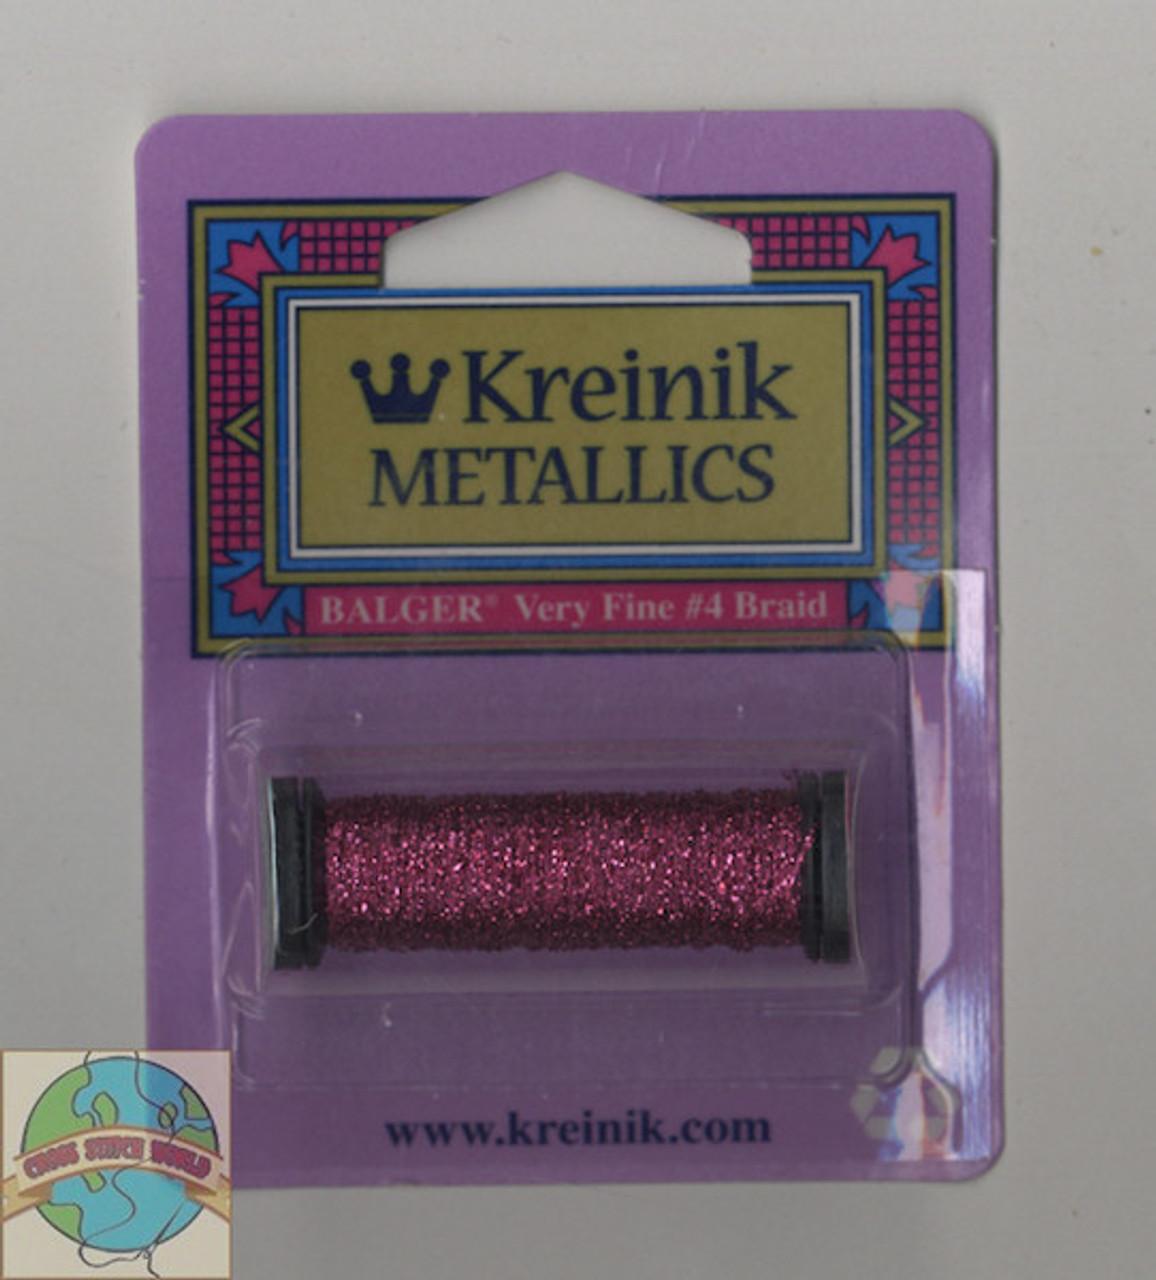 Kreinik Metallics - Very Fine #4 Fuschsia #024